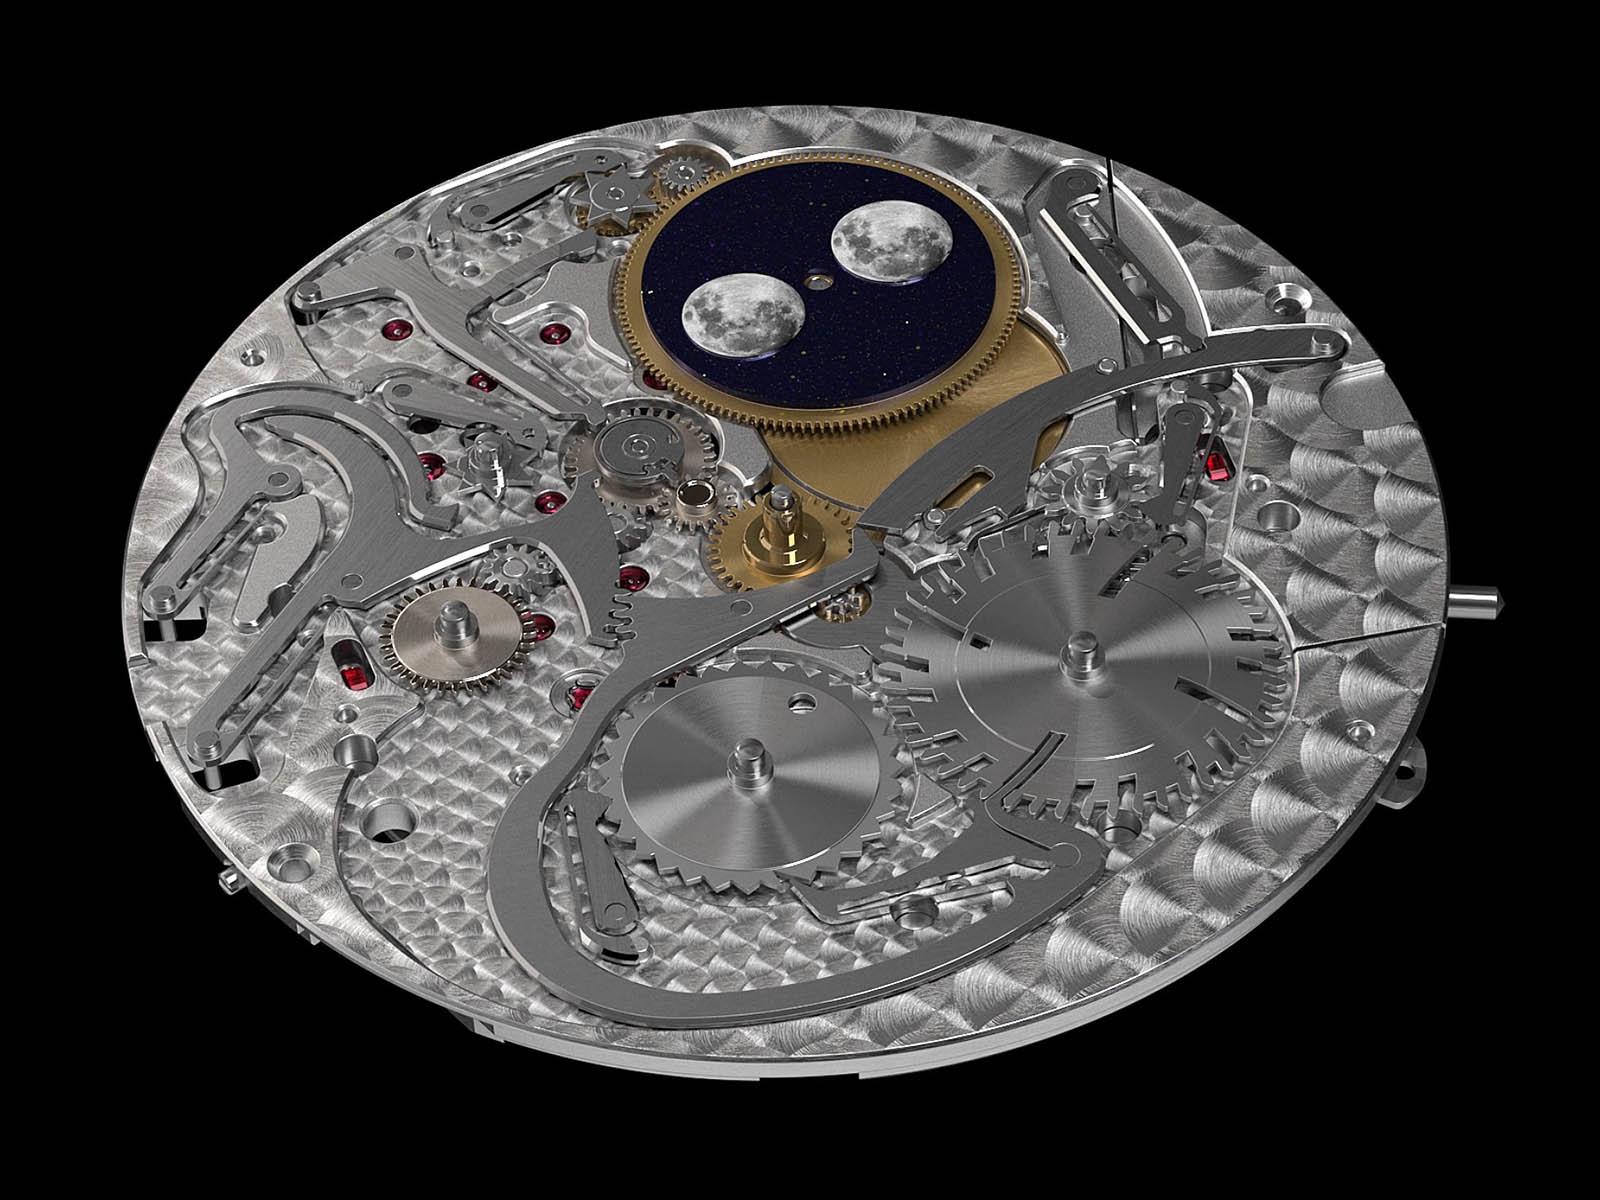 26586ip-oo-1240ip-01-audemars-piguet-royal-oak-perpetual-calendar-ultra-thin-6.jpg